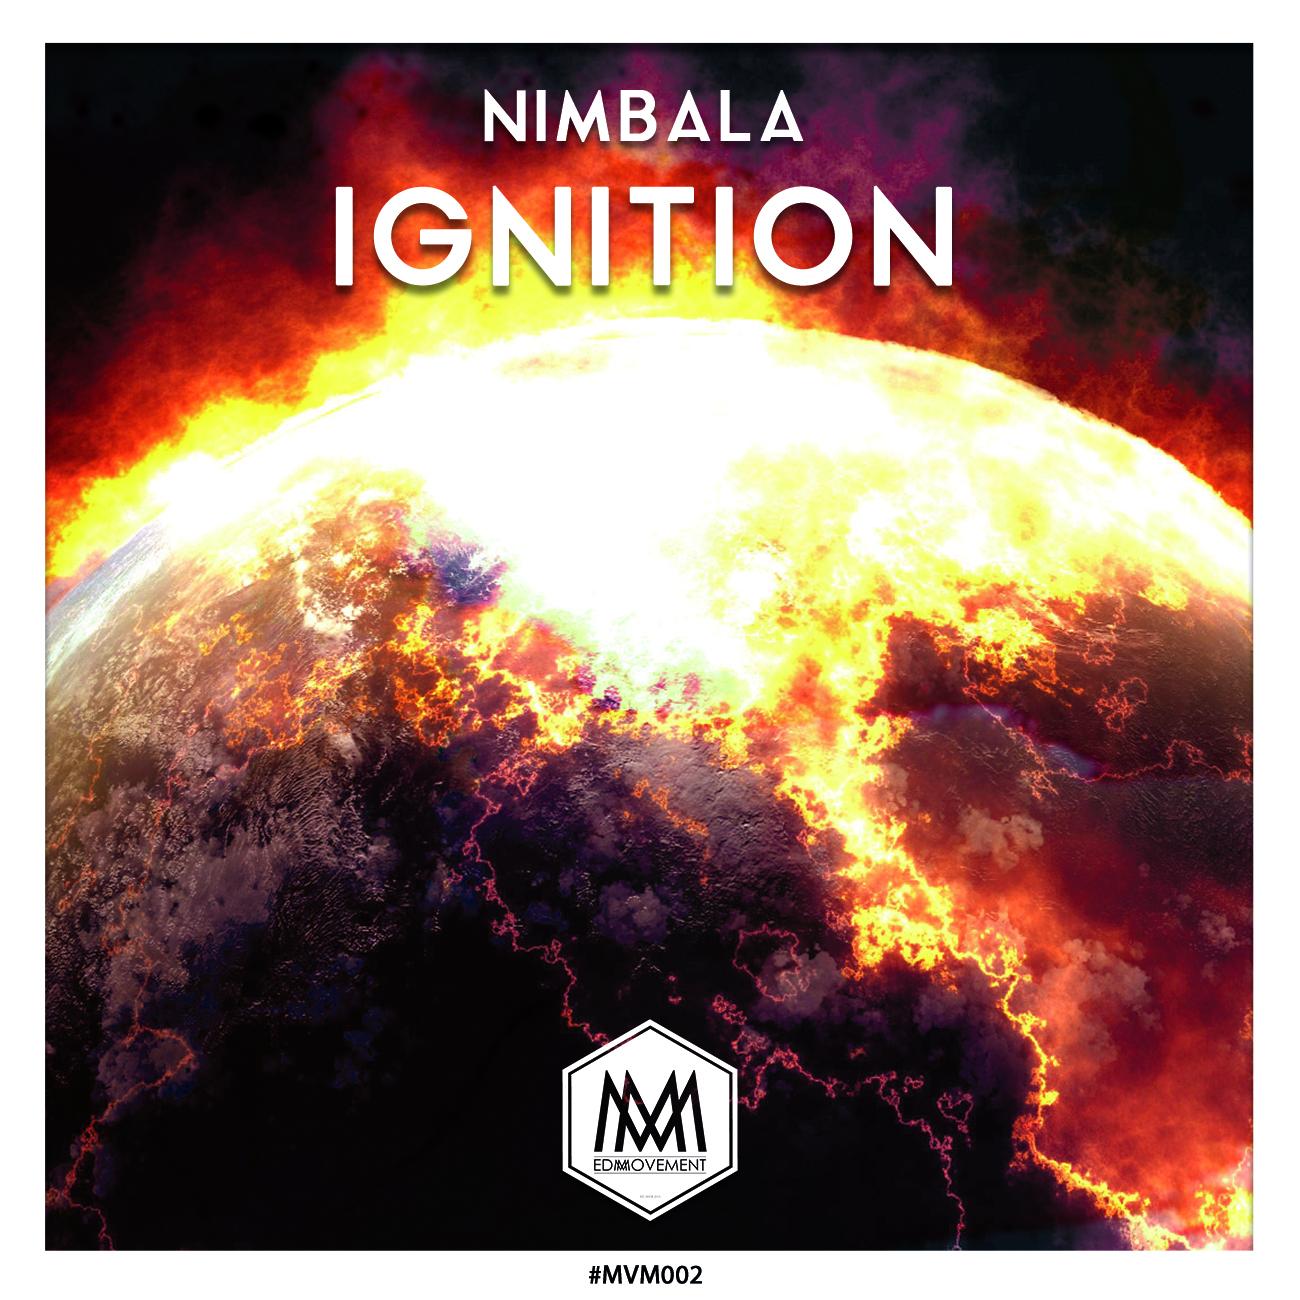 Nimbala - Ignition Cover Art